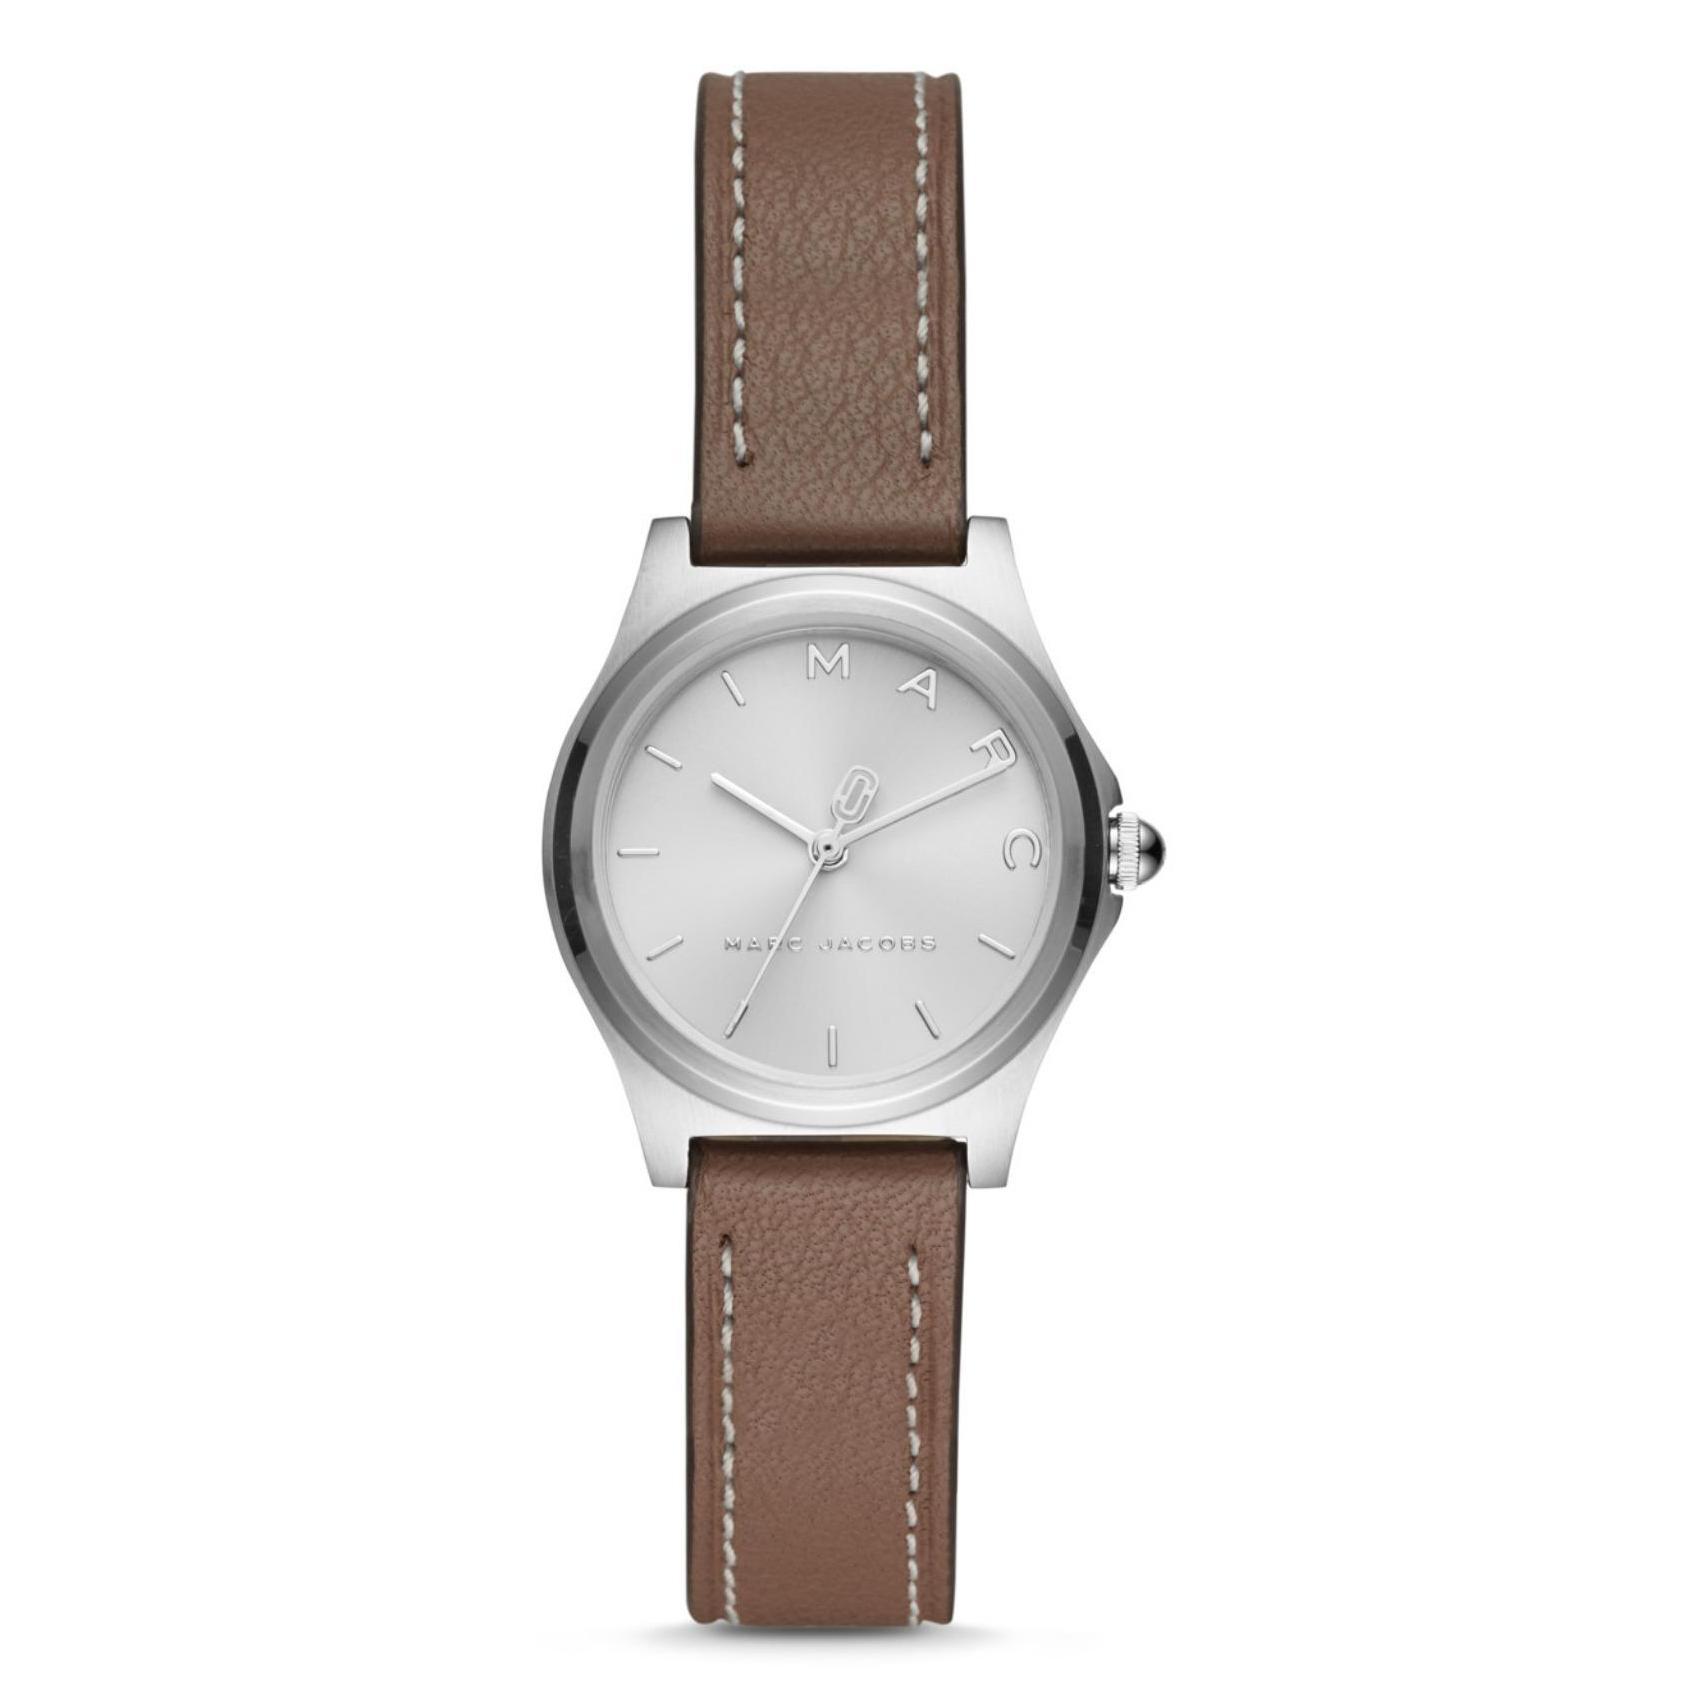 Marc By Marc Jacob Hendry - Silver Dial 28mm - Cement Leather Strap - Jam Tangan Analog Wanita - MJ1643 - Original dan Garansi Watch Care